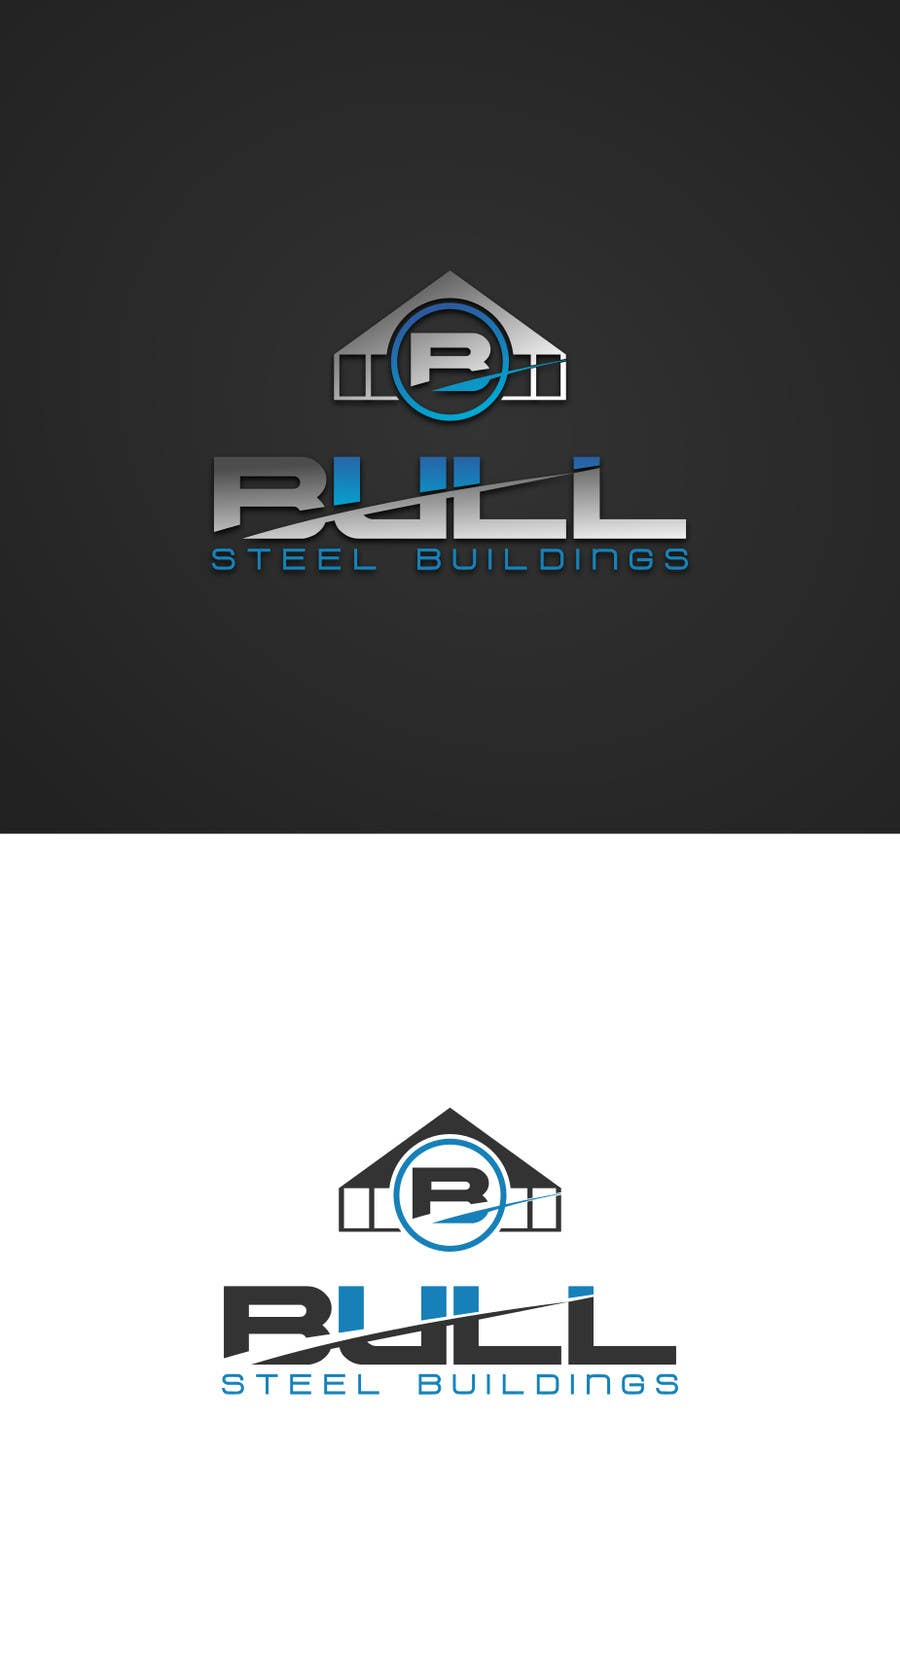 Proposition n°175 du concours Design a Logo for Steel Building Maker